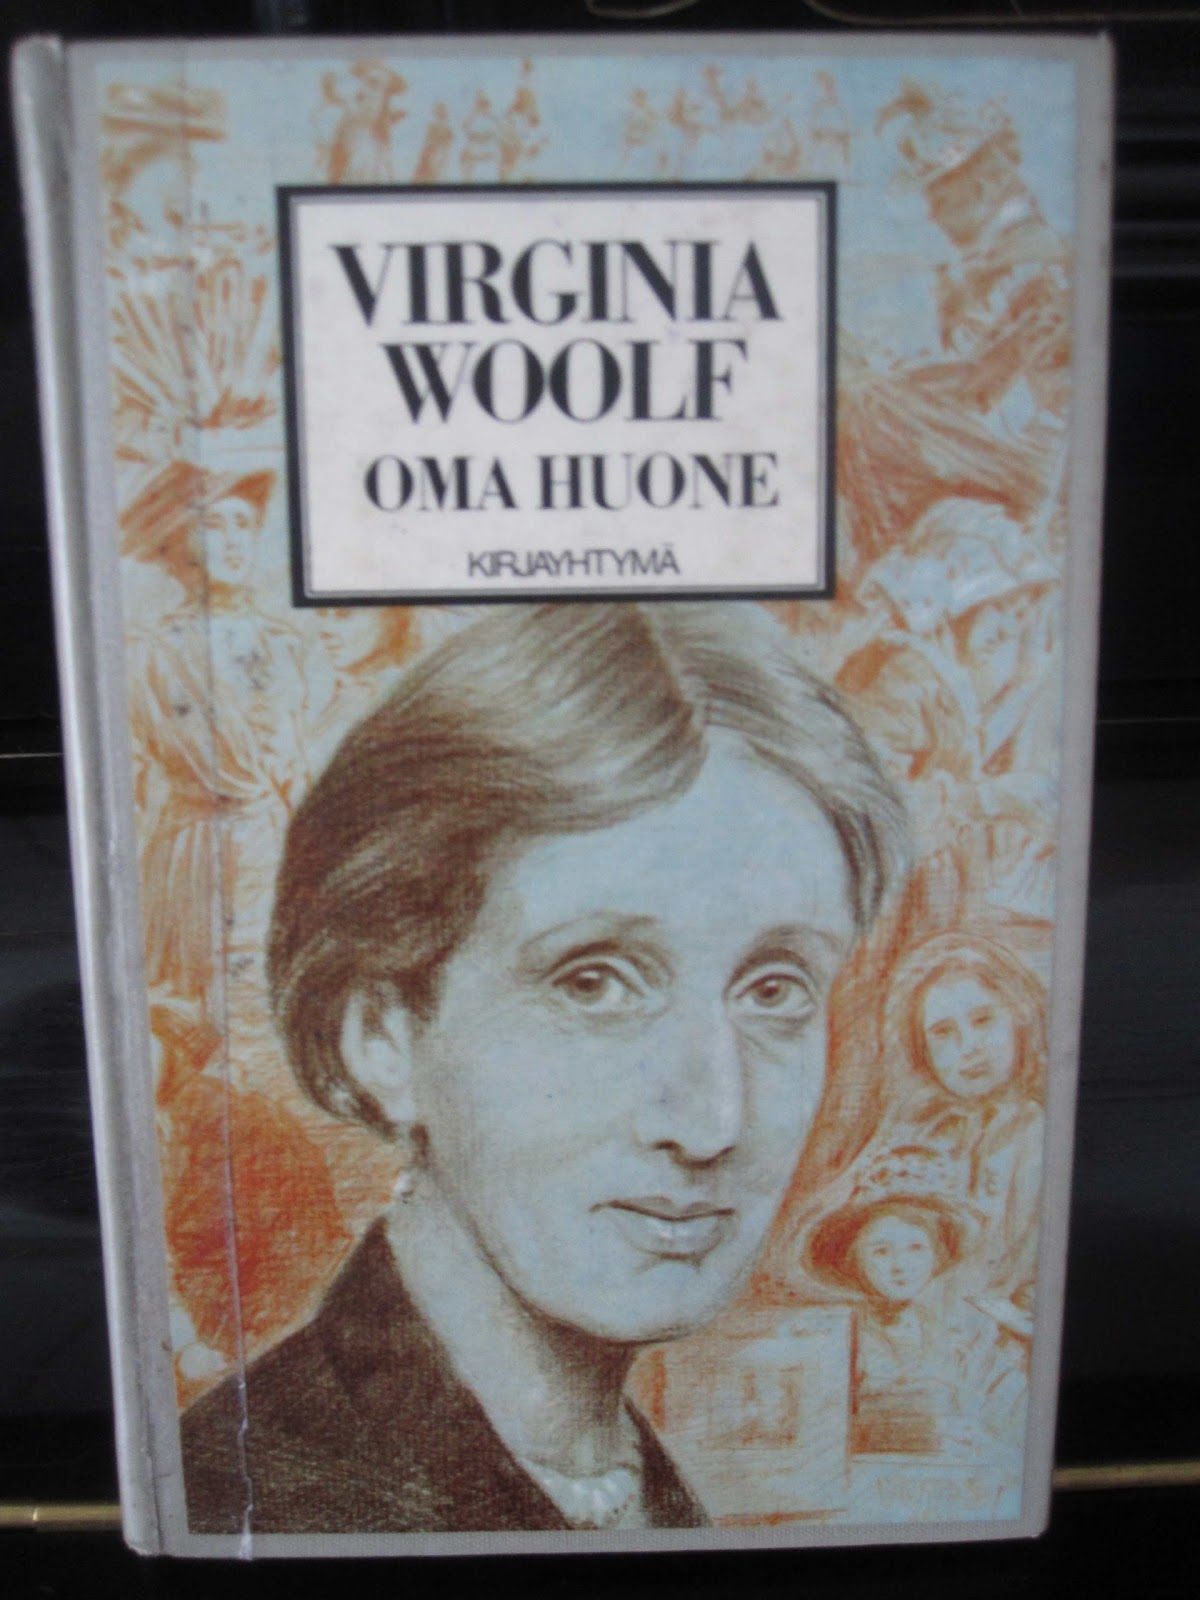 Virginia Woolf Oma Huone